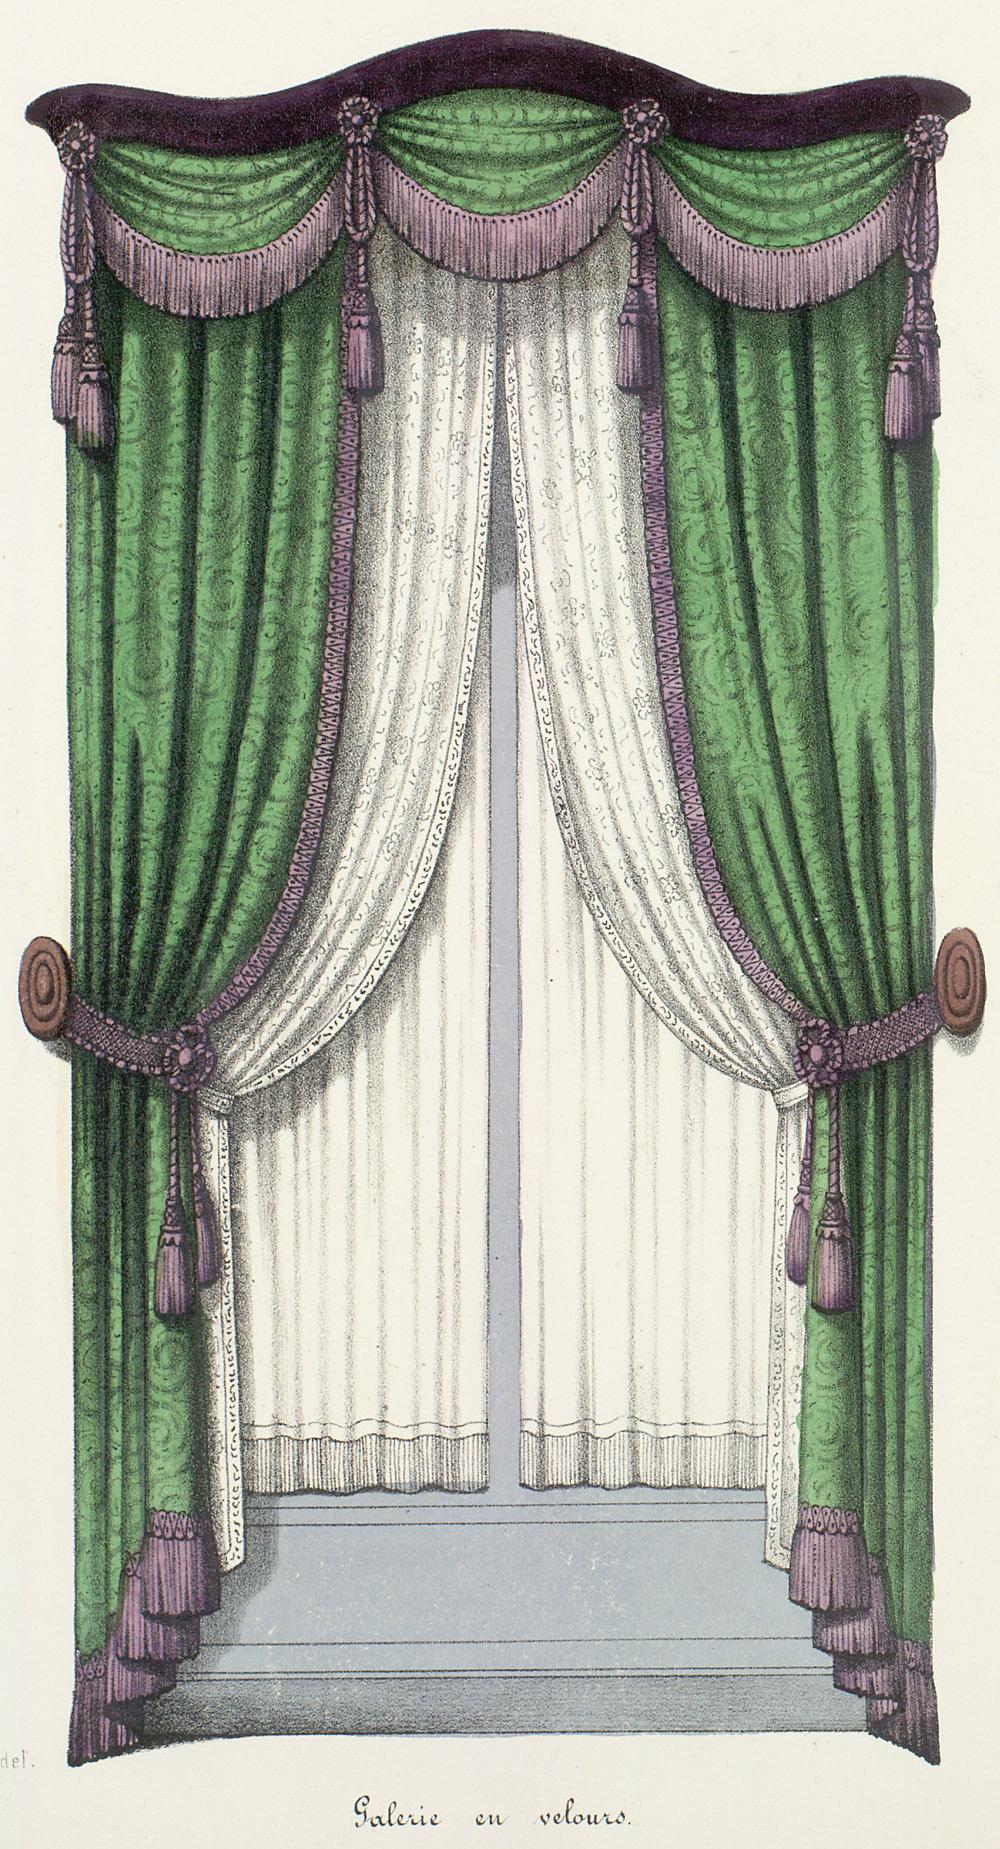 Window Treatment,  Image number:SIL12-2-135b